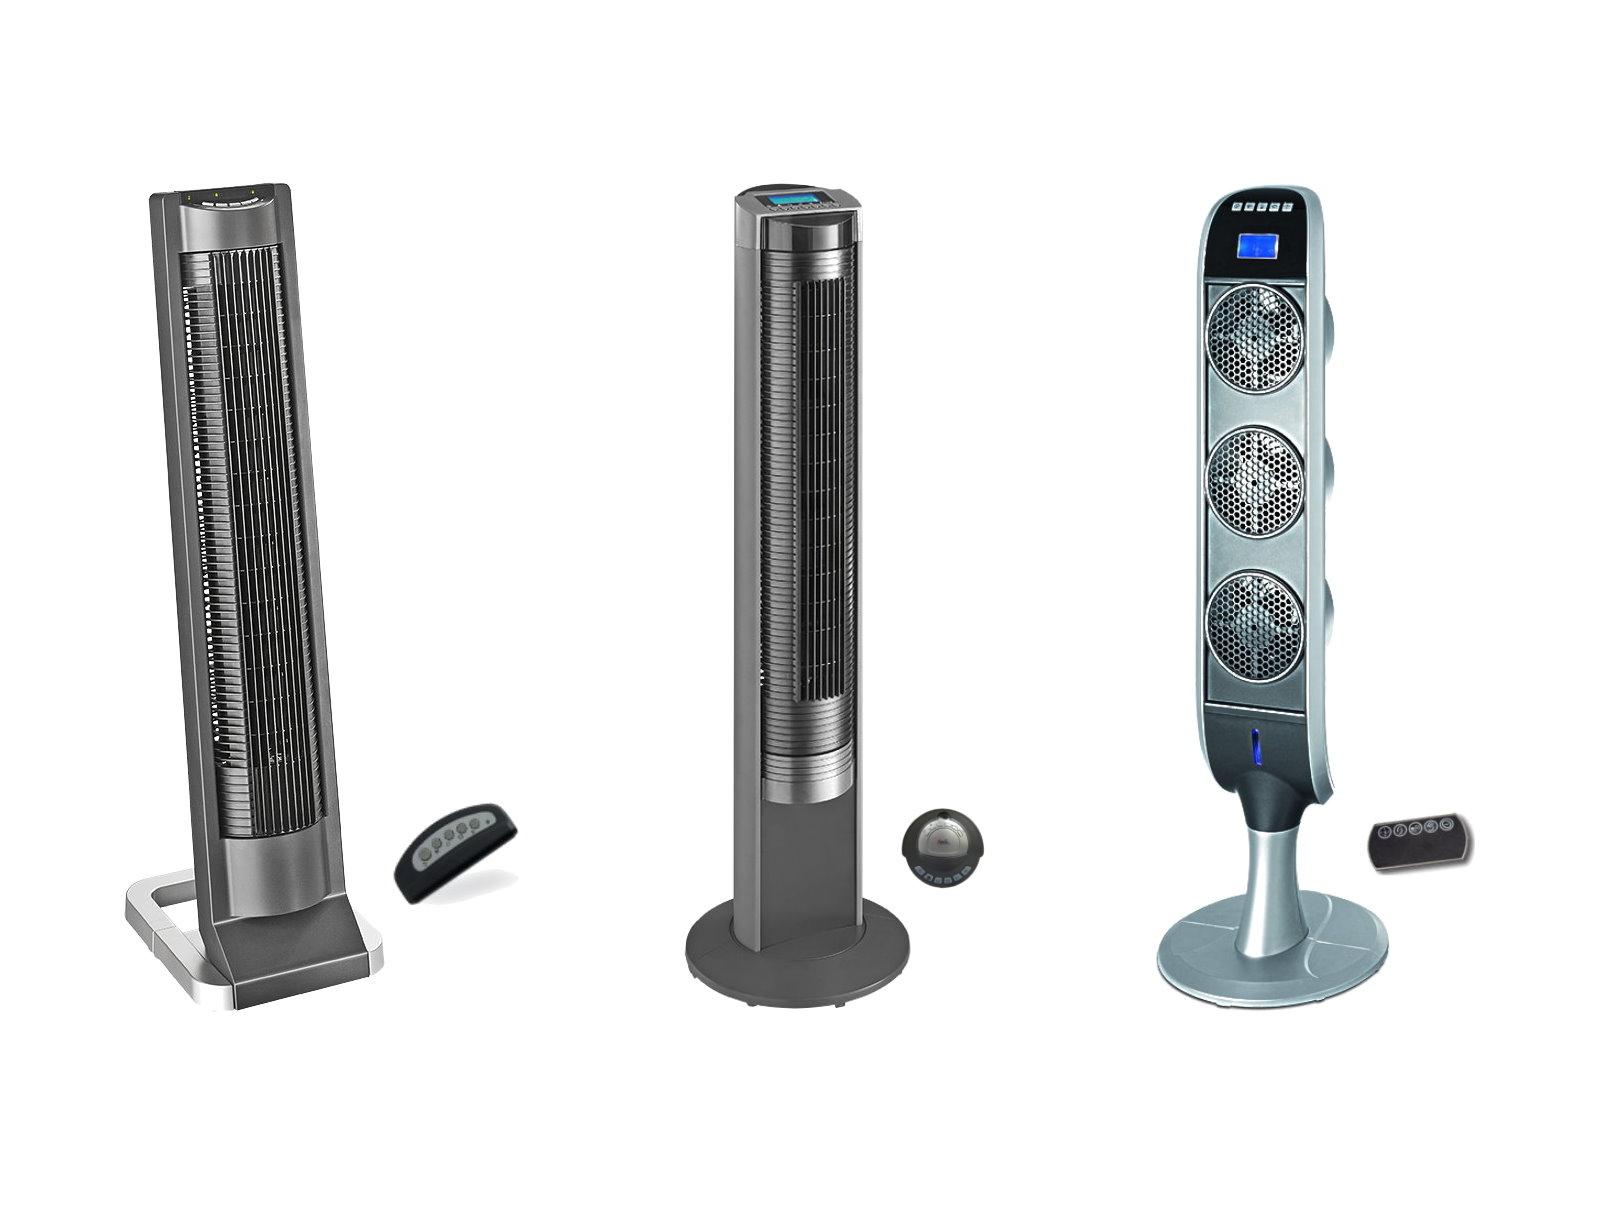 ventilator towerventilator s ulenventilator fernbedienung. Black Bedroom Furniture Sets. Home Design Ideas